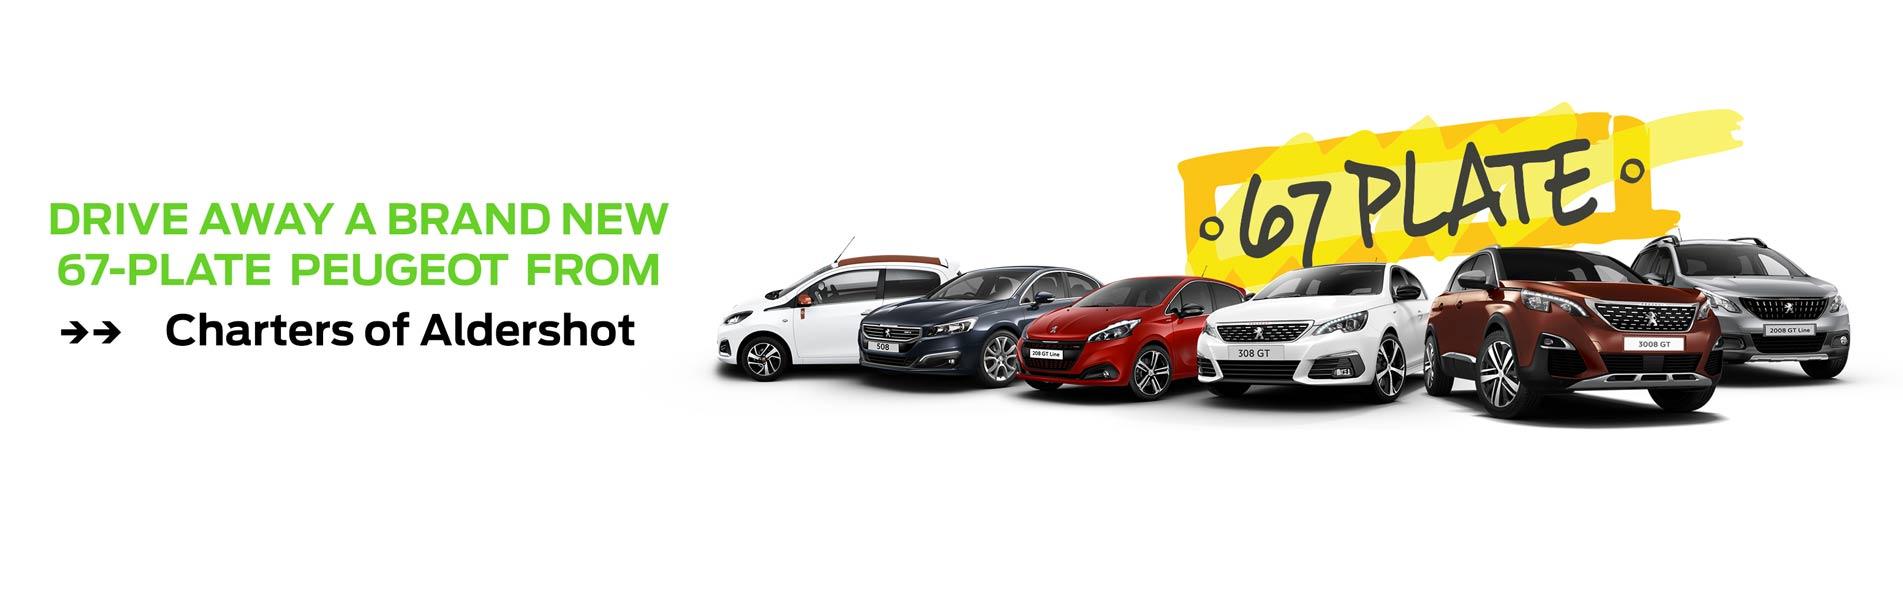 drive-a-brand-new-67-plate-peugeot-from-charters-peugeot-aldershot-sli